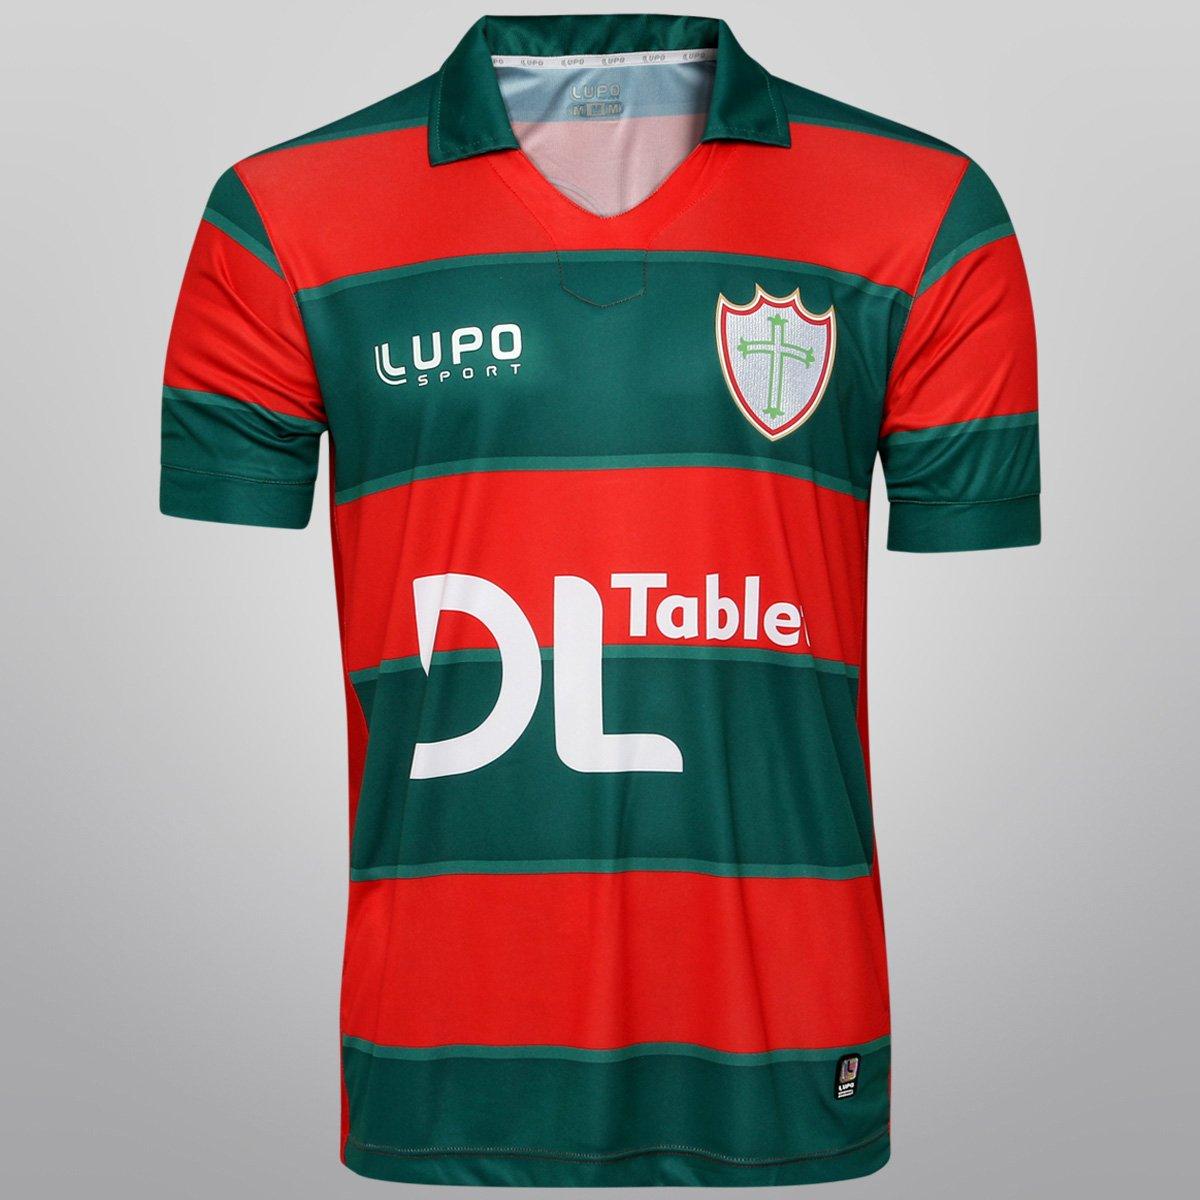 Camisa Lupo Portuguesa I 2014 n° 10 - Compre Agora  b10b98e48be41